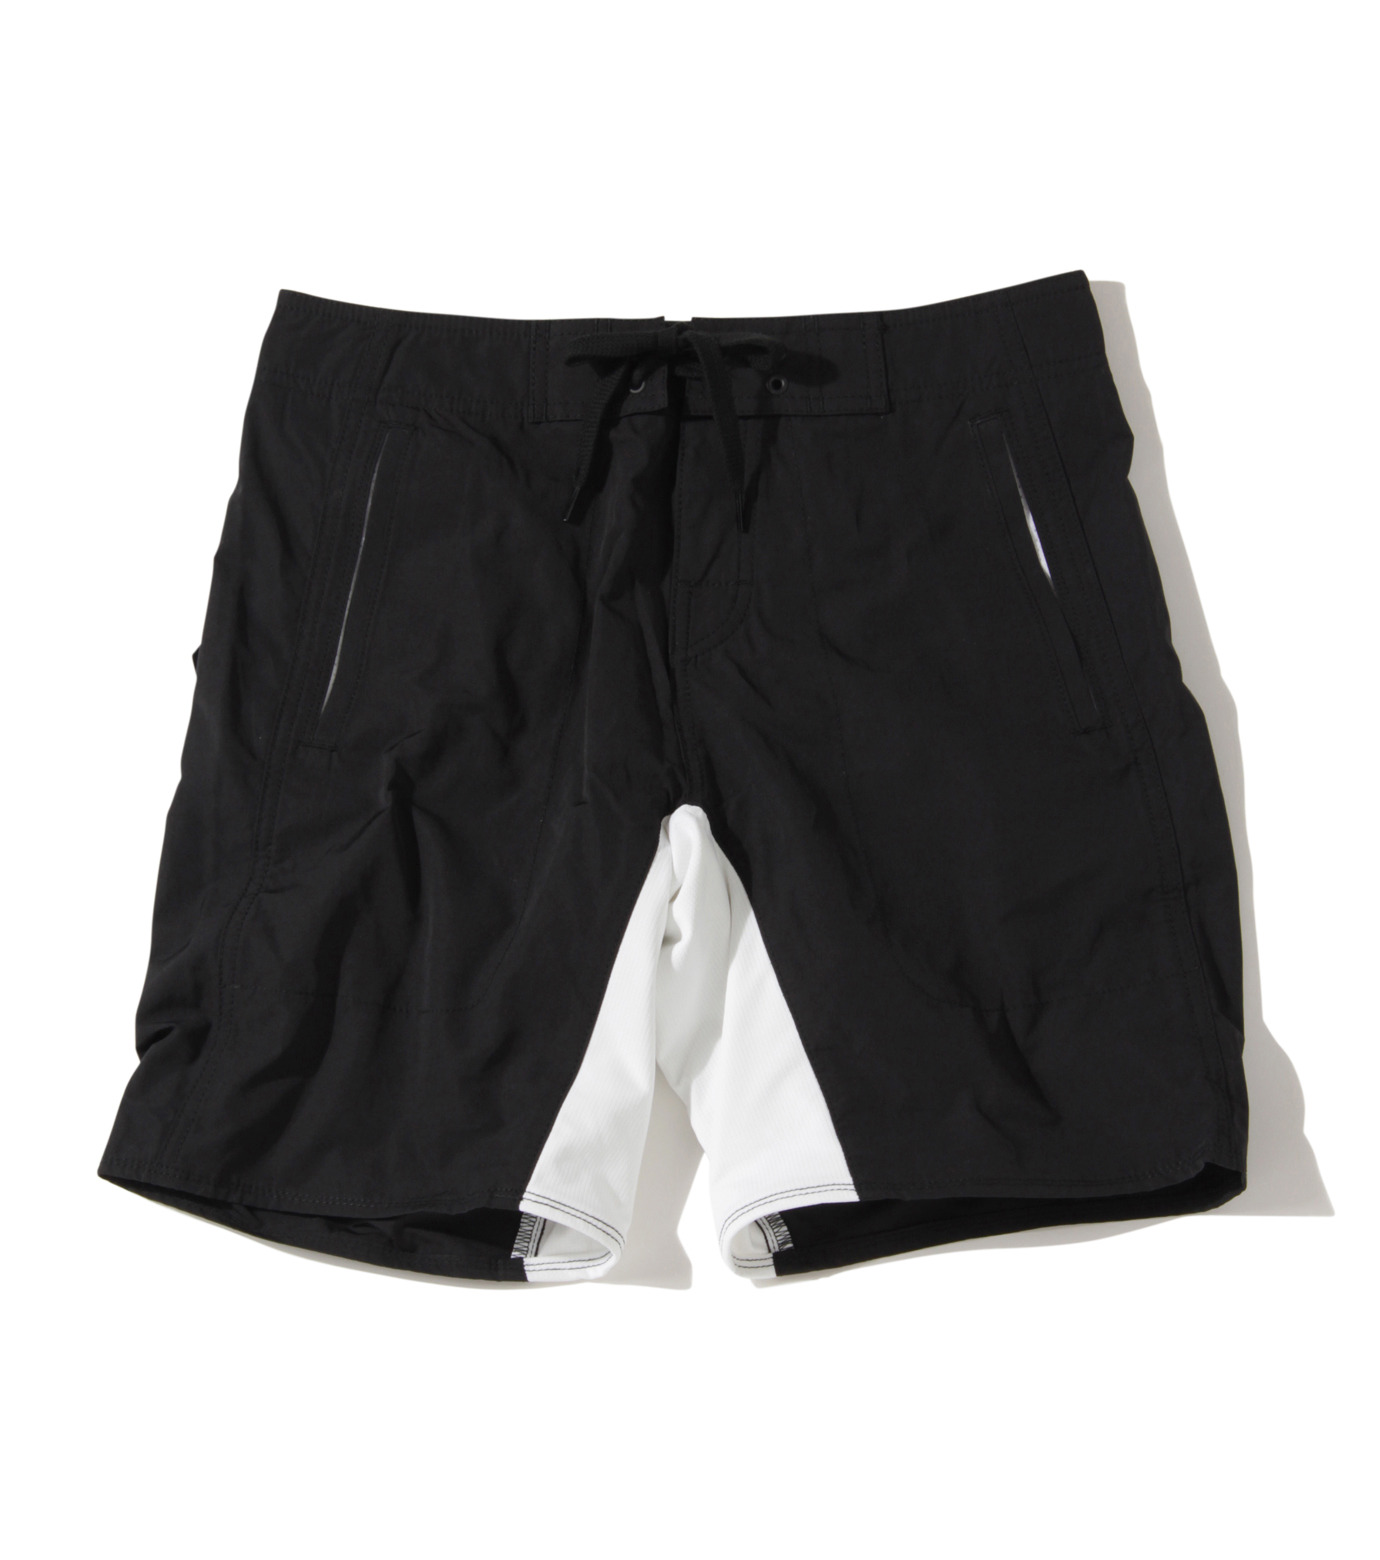 TWO TWO ONE(トゥートゥーワン)のSurf shorts short-WHITE(SWIMWEAR/SWIMWEAR)-15N948001-4 拡大詳細画像1